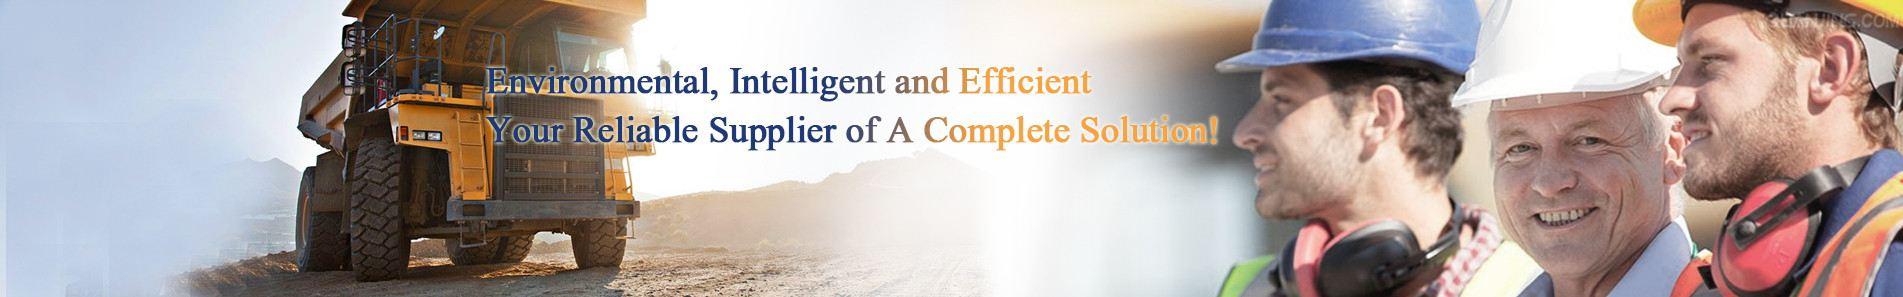 environmental-sanitation-equipment